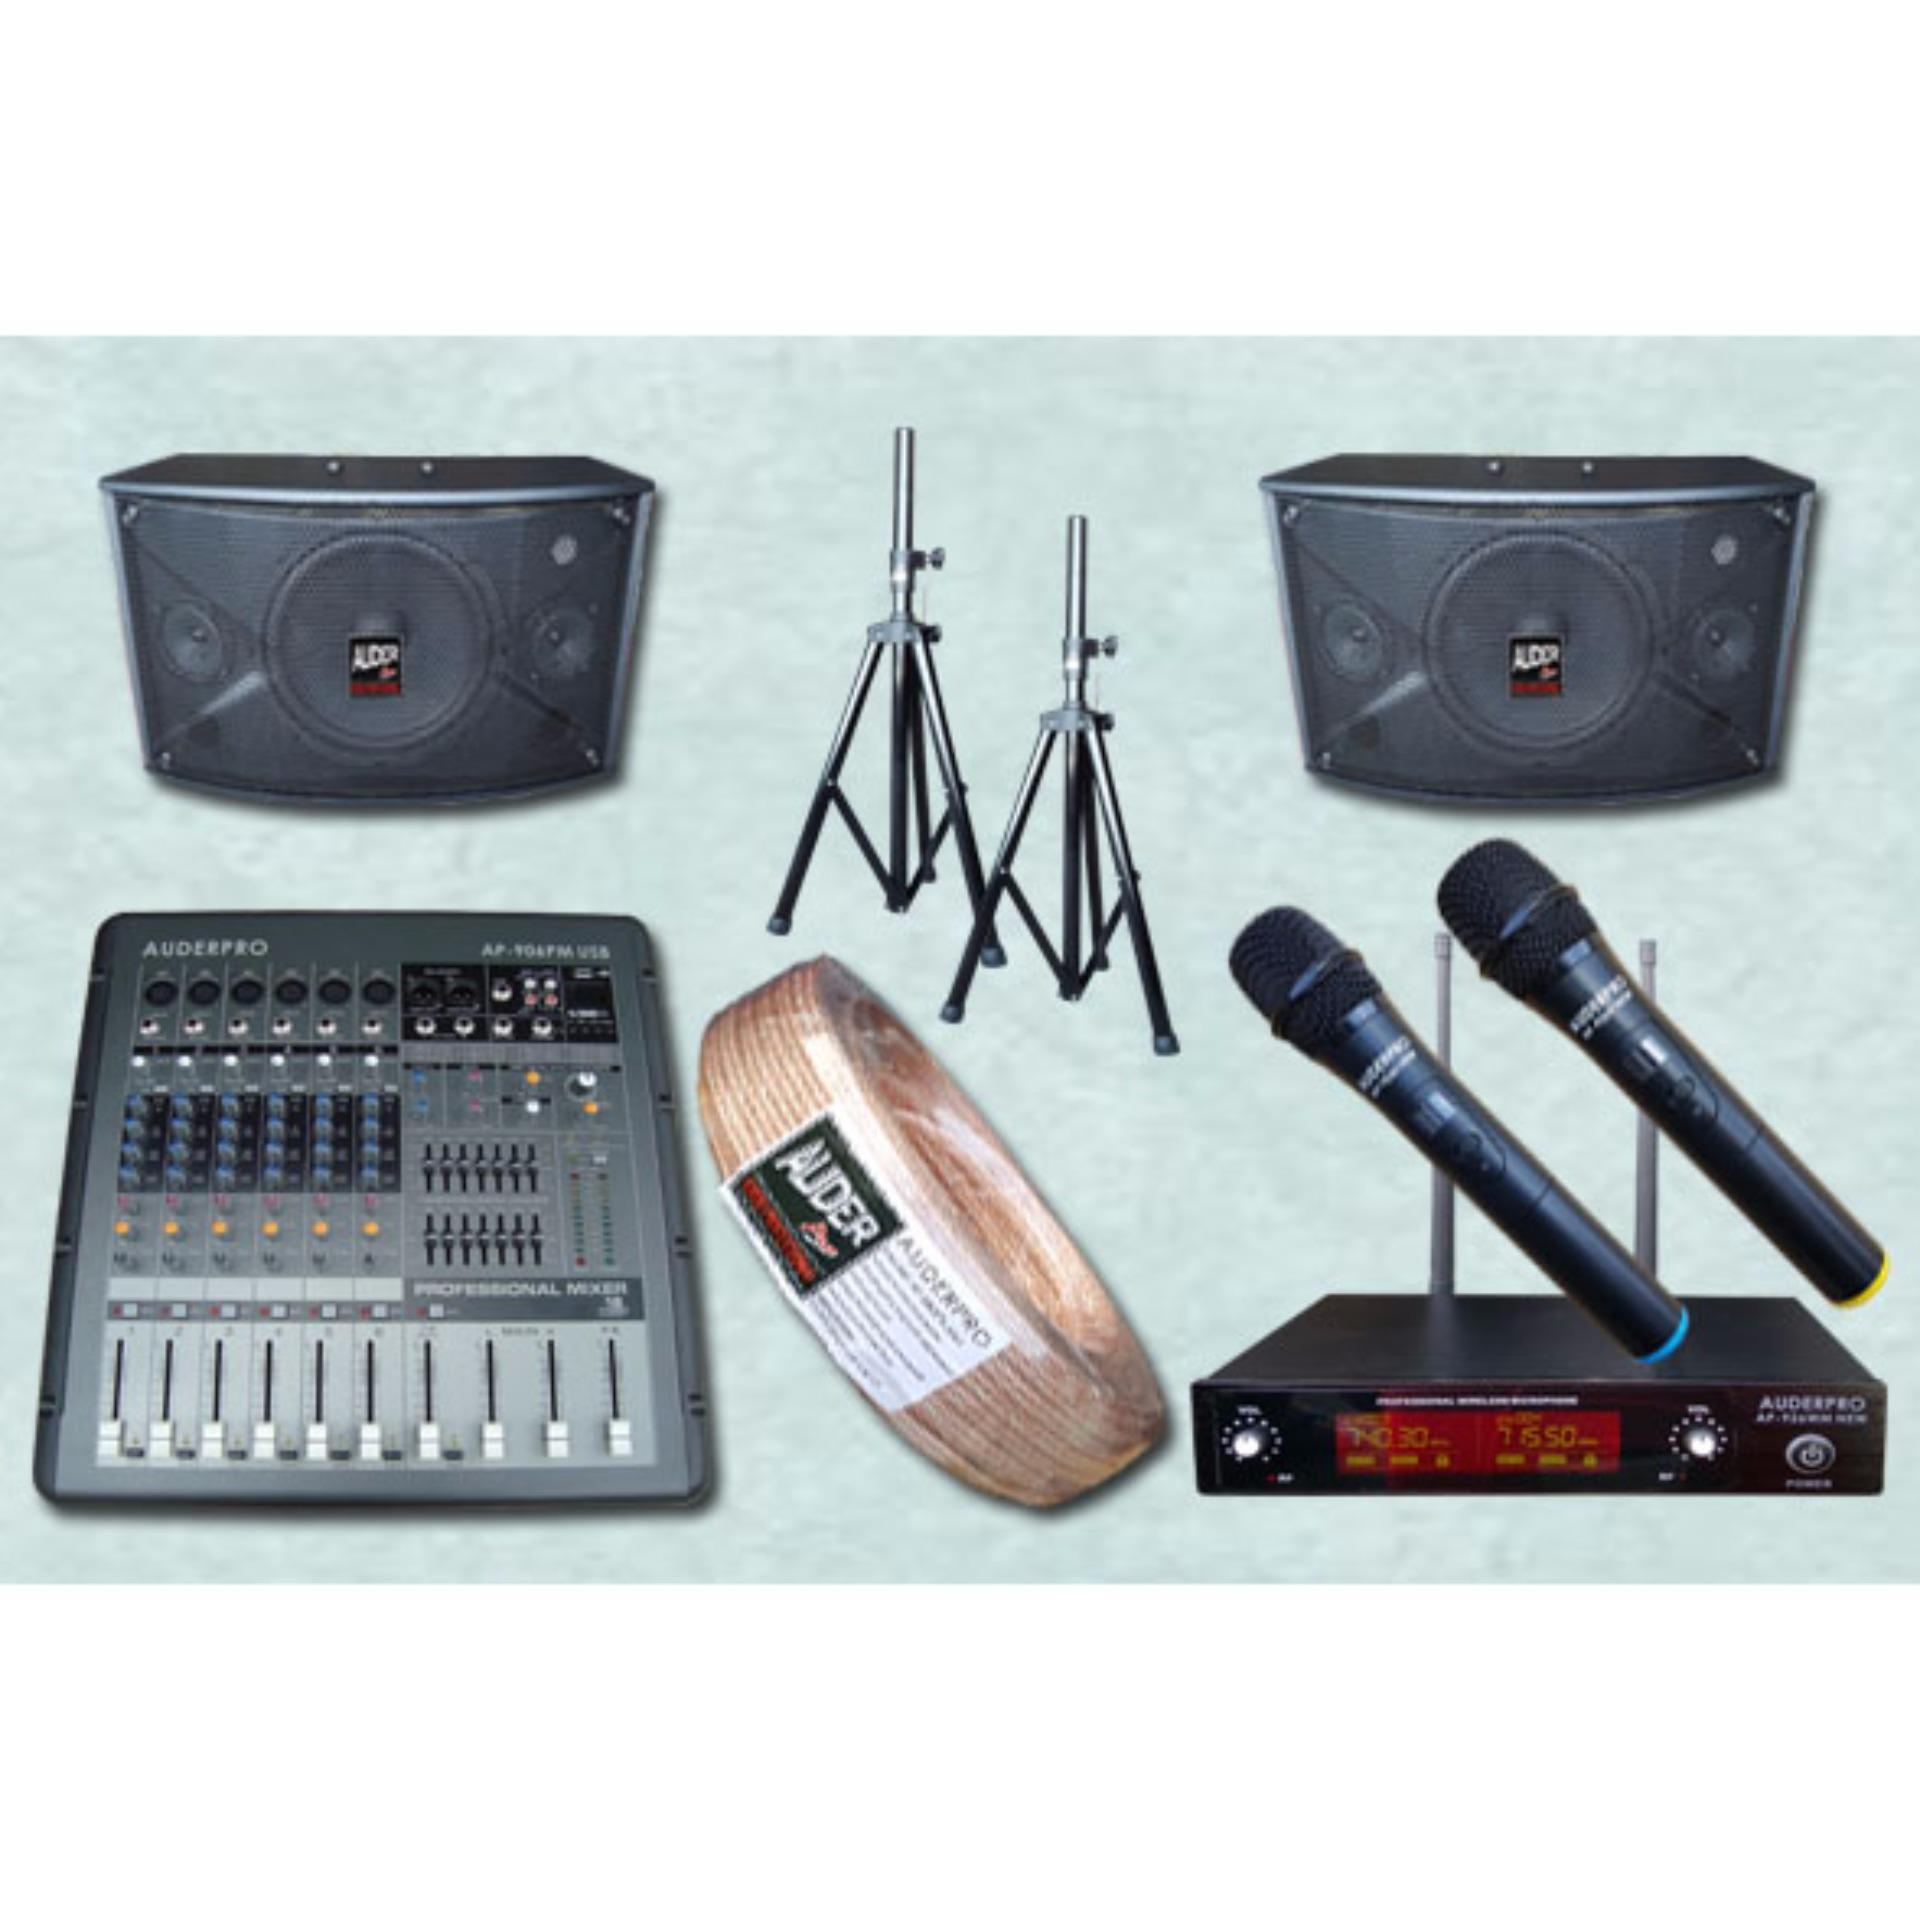 Diskon Paket Sound System Karaoke Meeting Kecil 7 Auderpro 8Inc Rekam Power Mixer